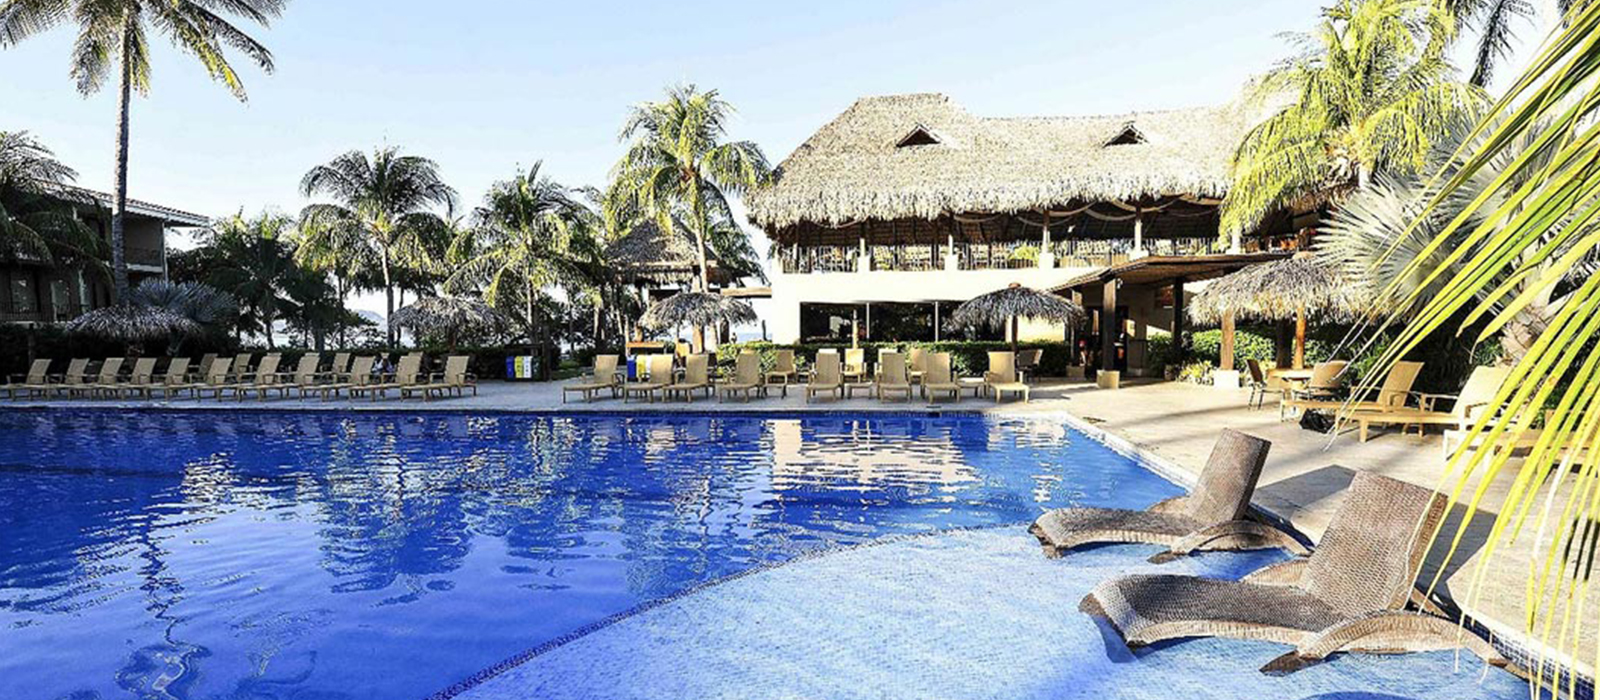 Margaritaville Beach Resort Playa Flamingo